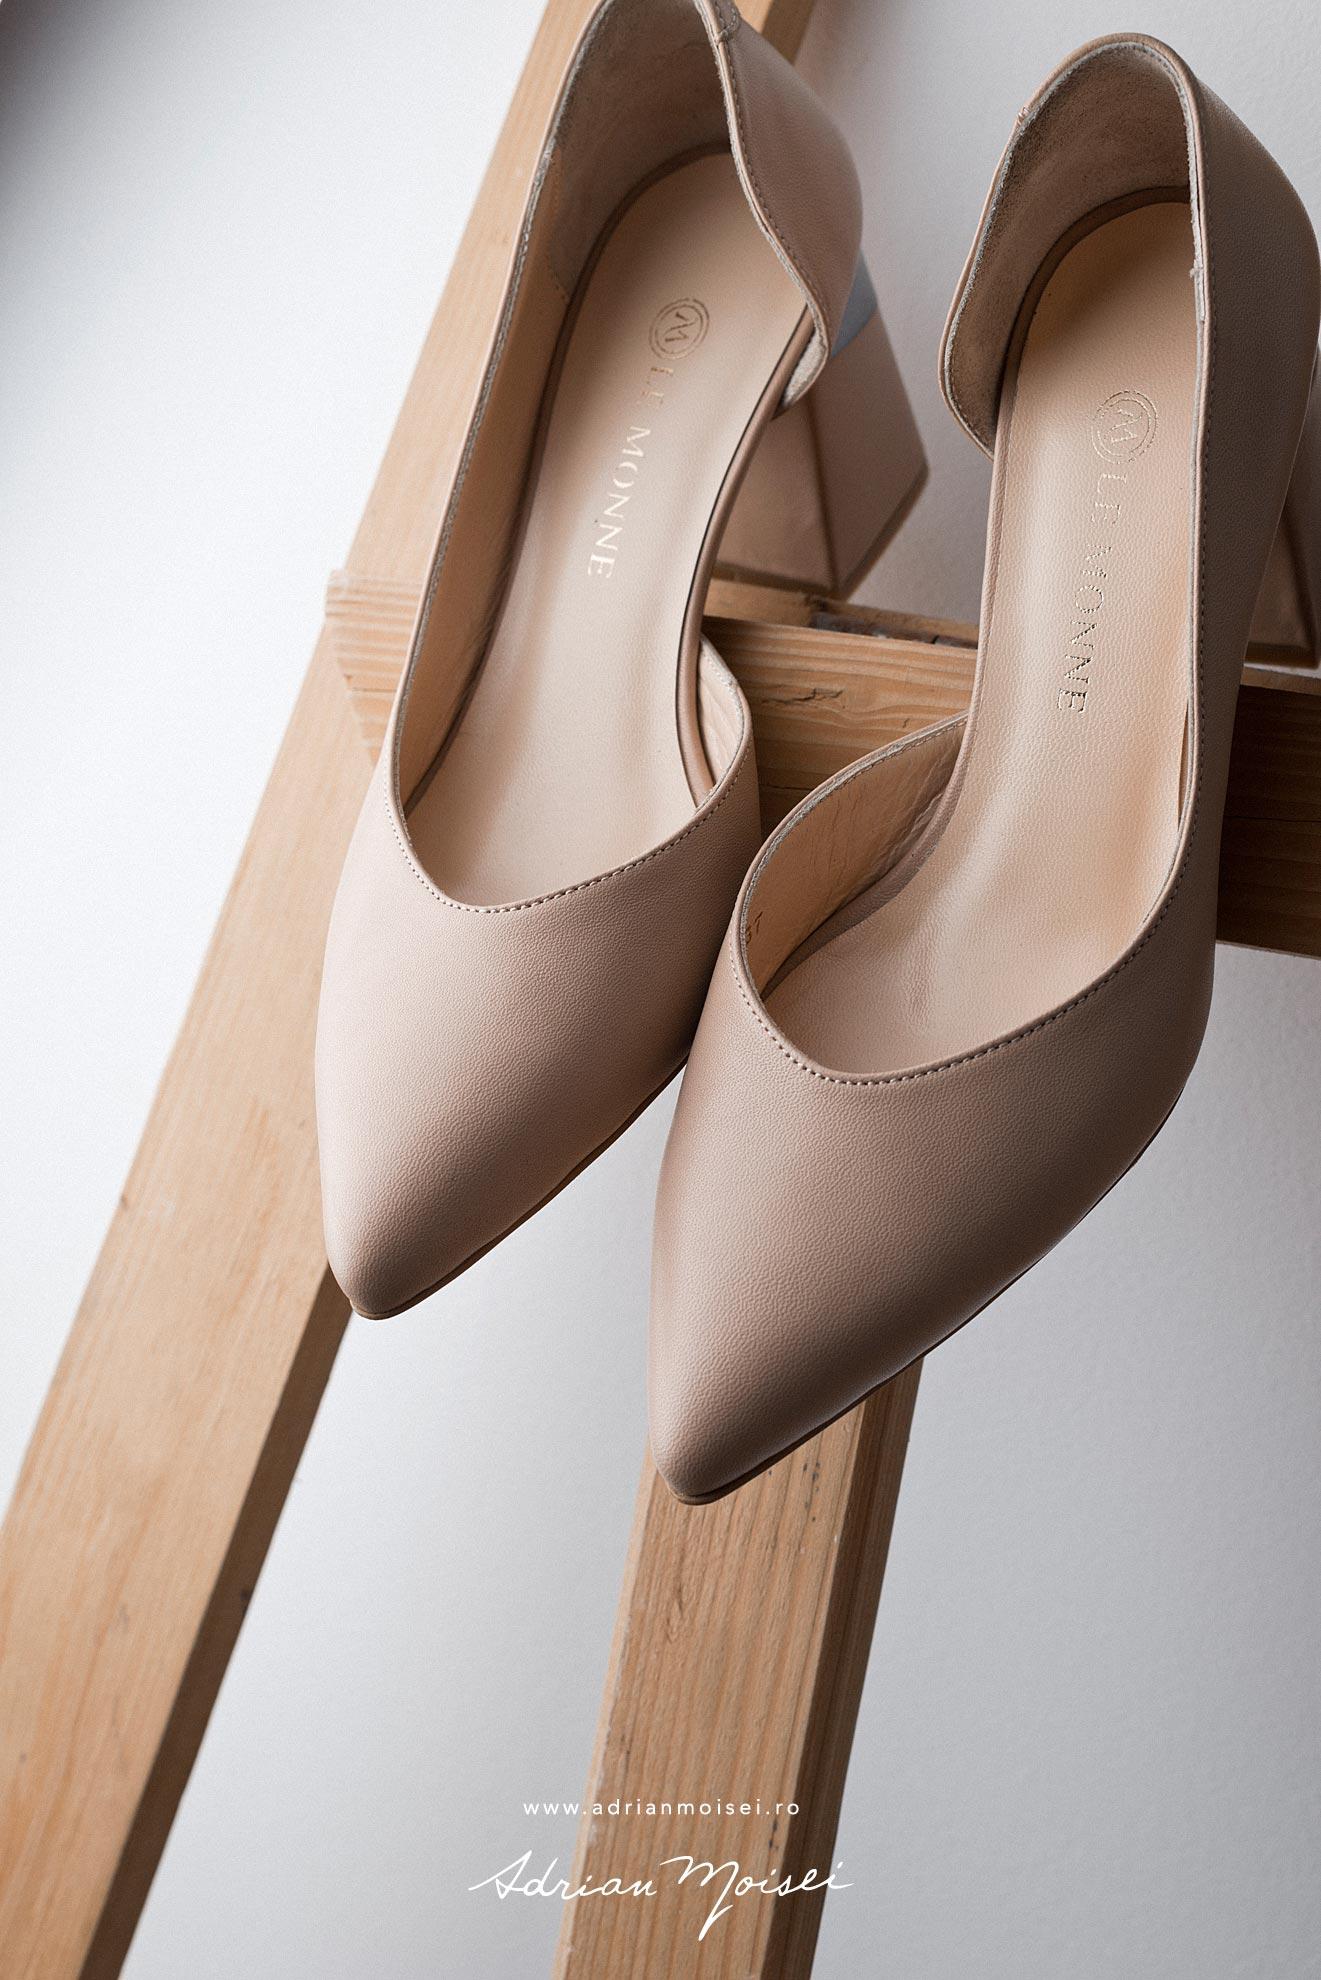 footwear photography photo studio iasi adrian moisei